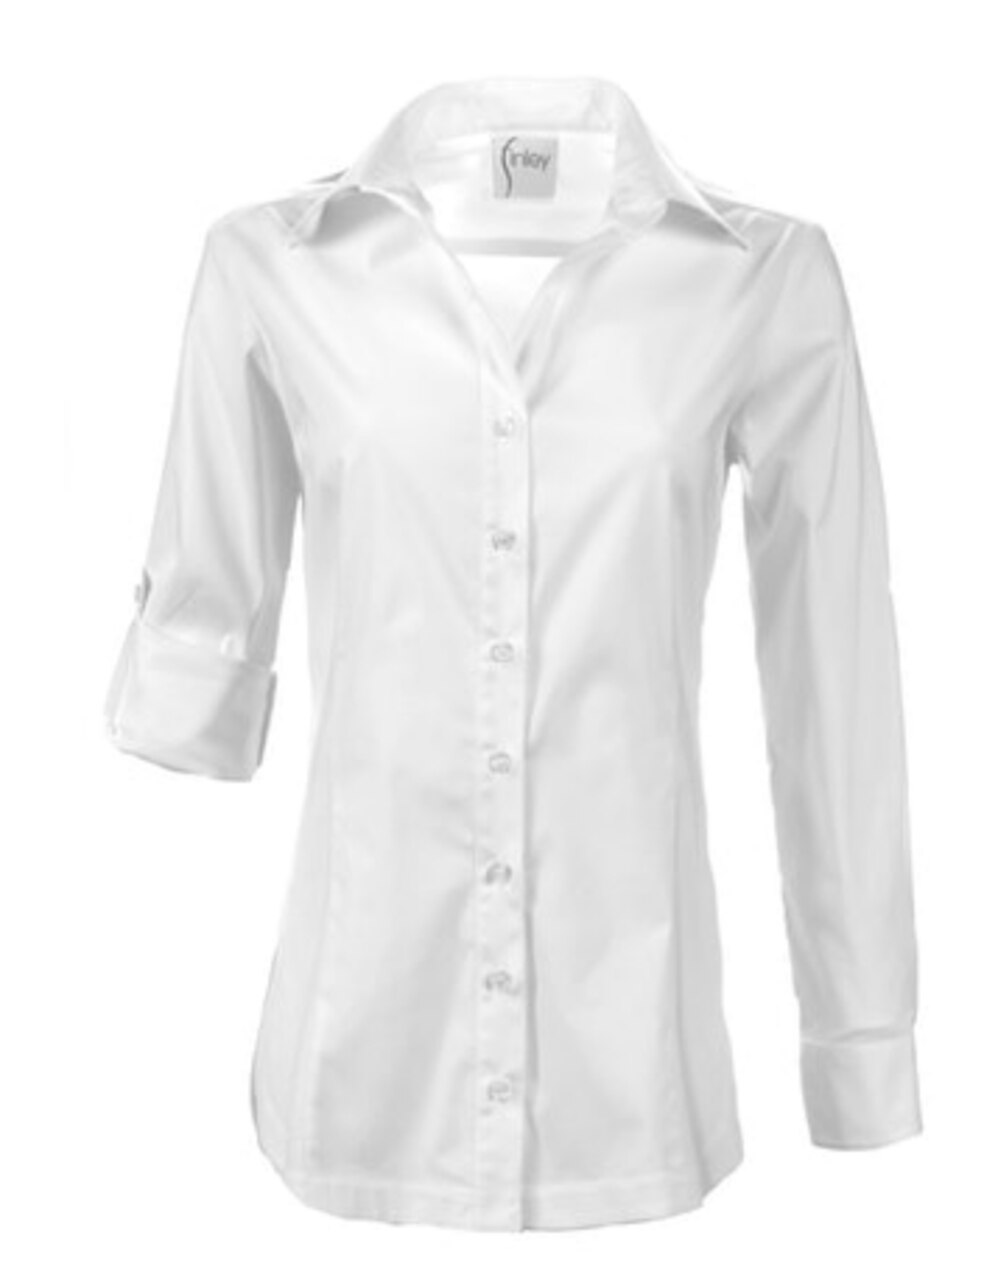 Cotton Poplin Classic Tailored Shirt – Finley